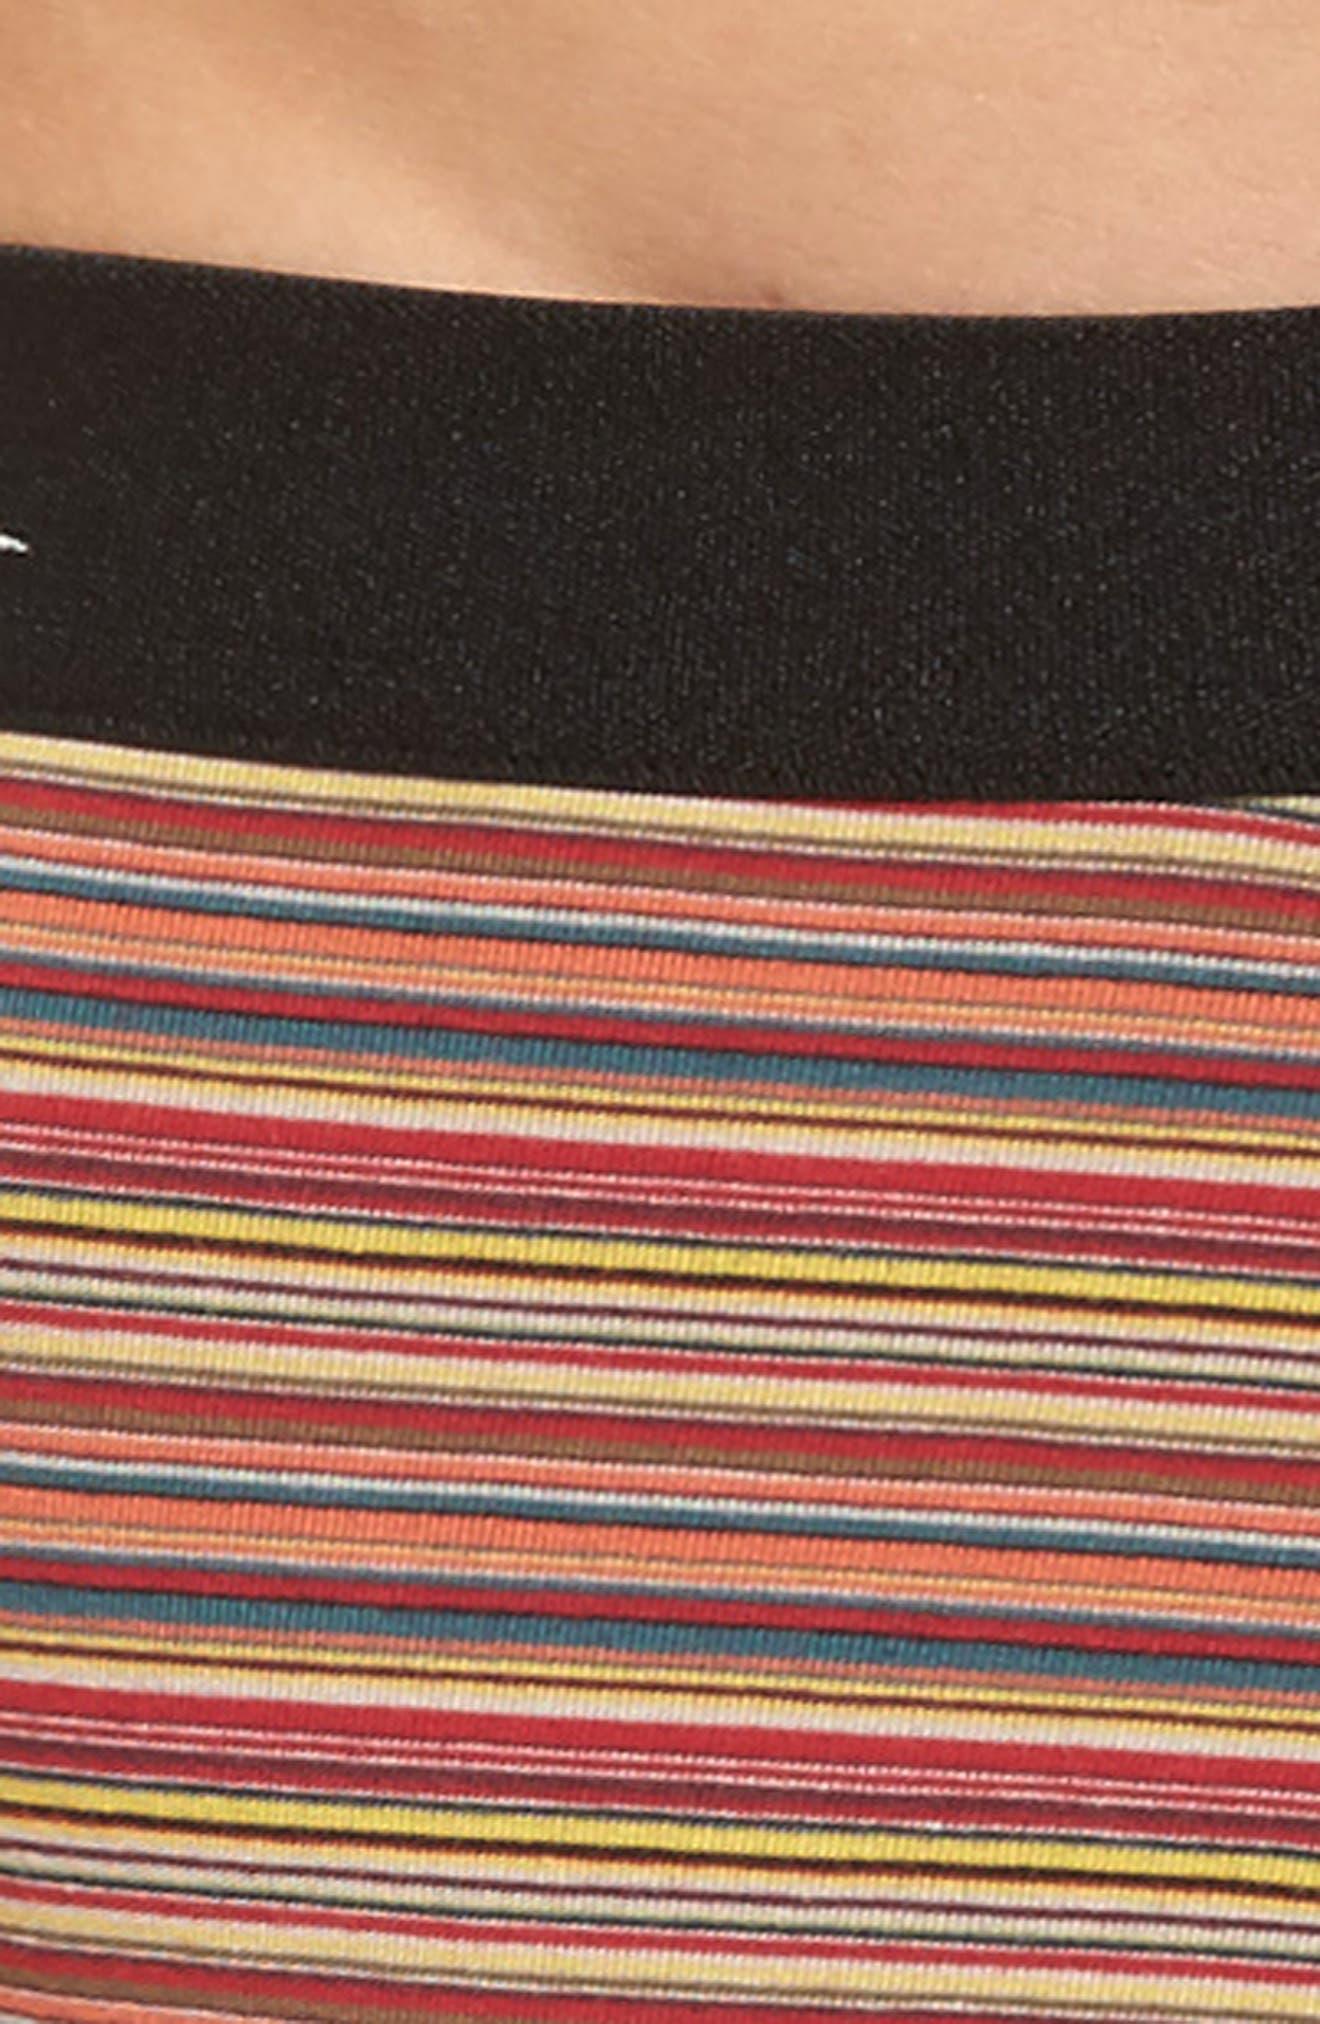 Multi Stripe Stretch Cotton Trunks,                             Alternate thumbnail 4, color,                             Brown